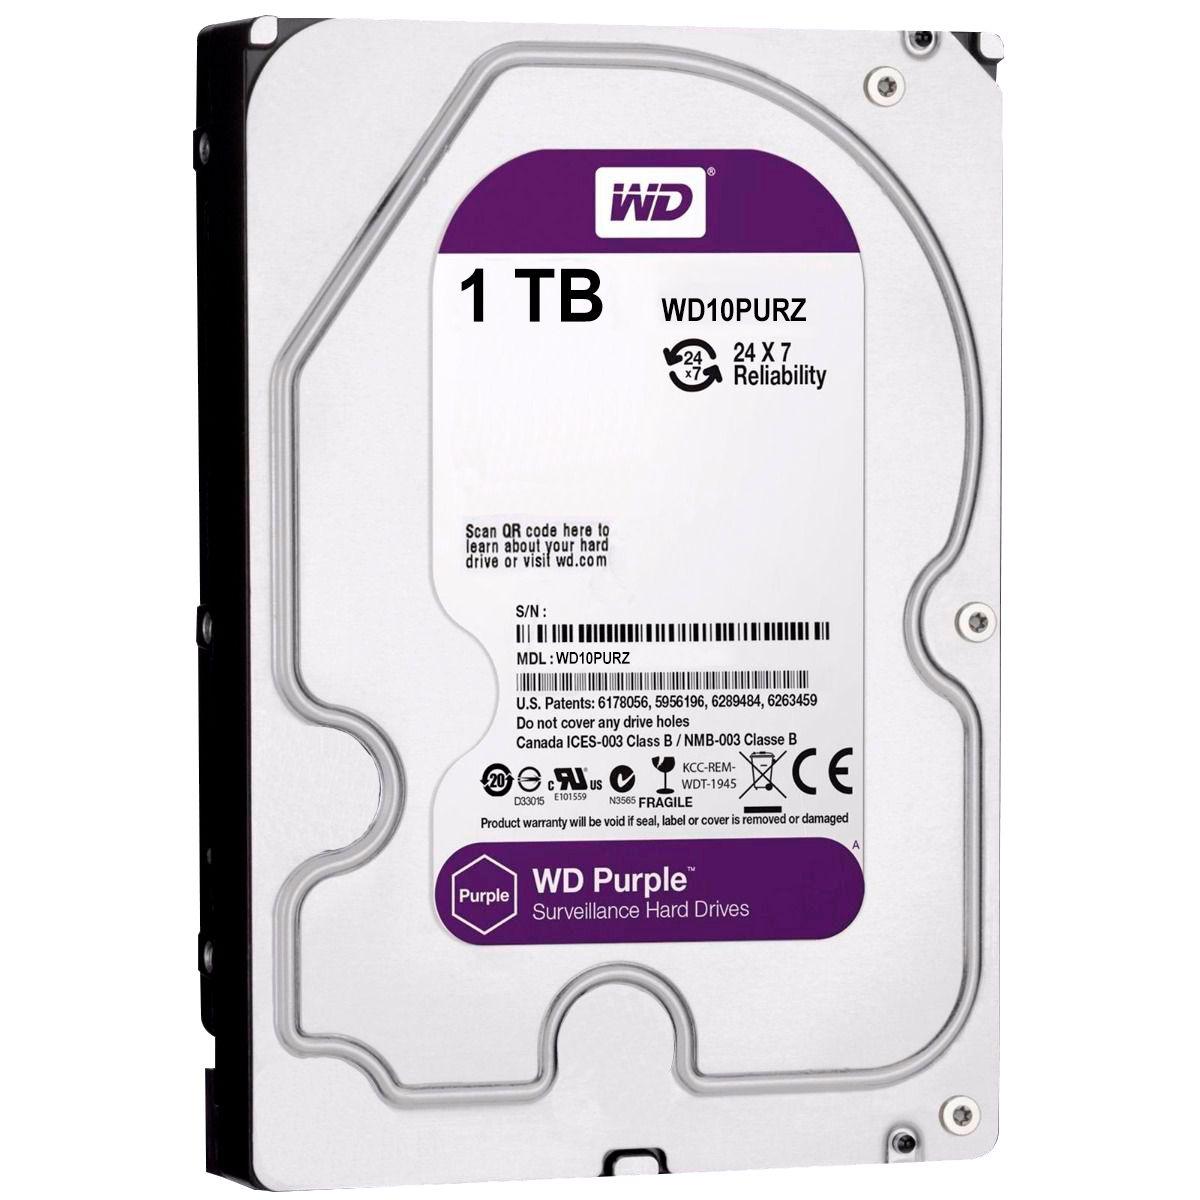 Kit 03 Câmeras IP HD 720p Intelbras VIP 1020 B G2 + NVD 1204 + HD WD Purple 1TB  - Tudo Forte